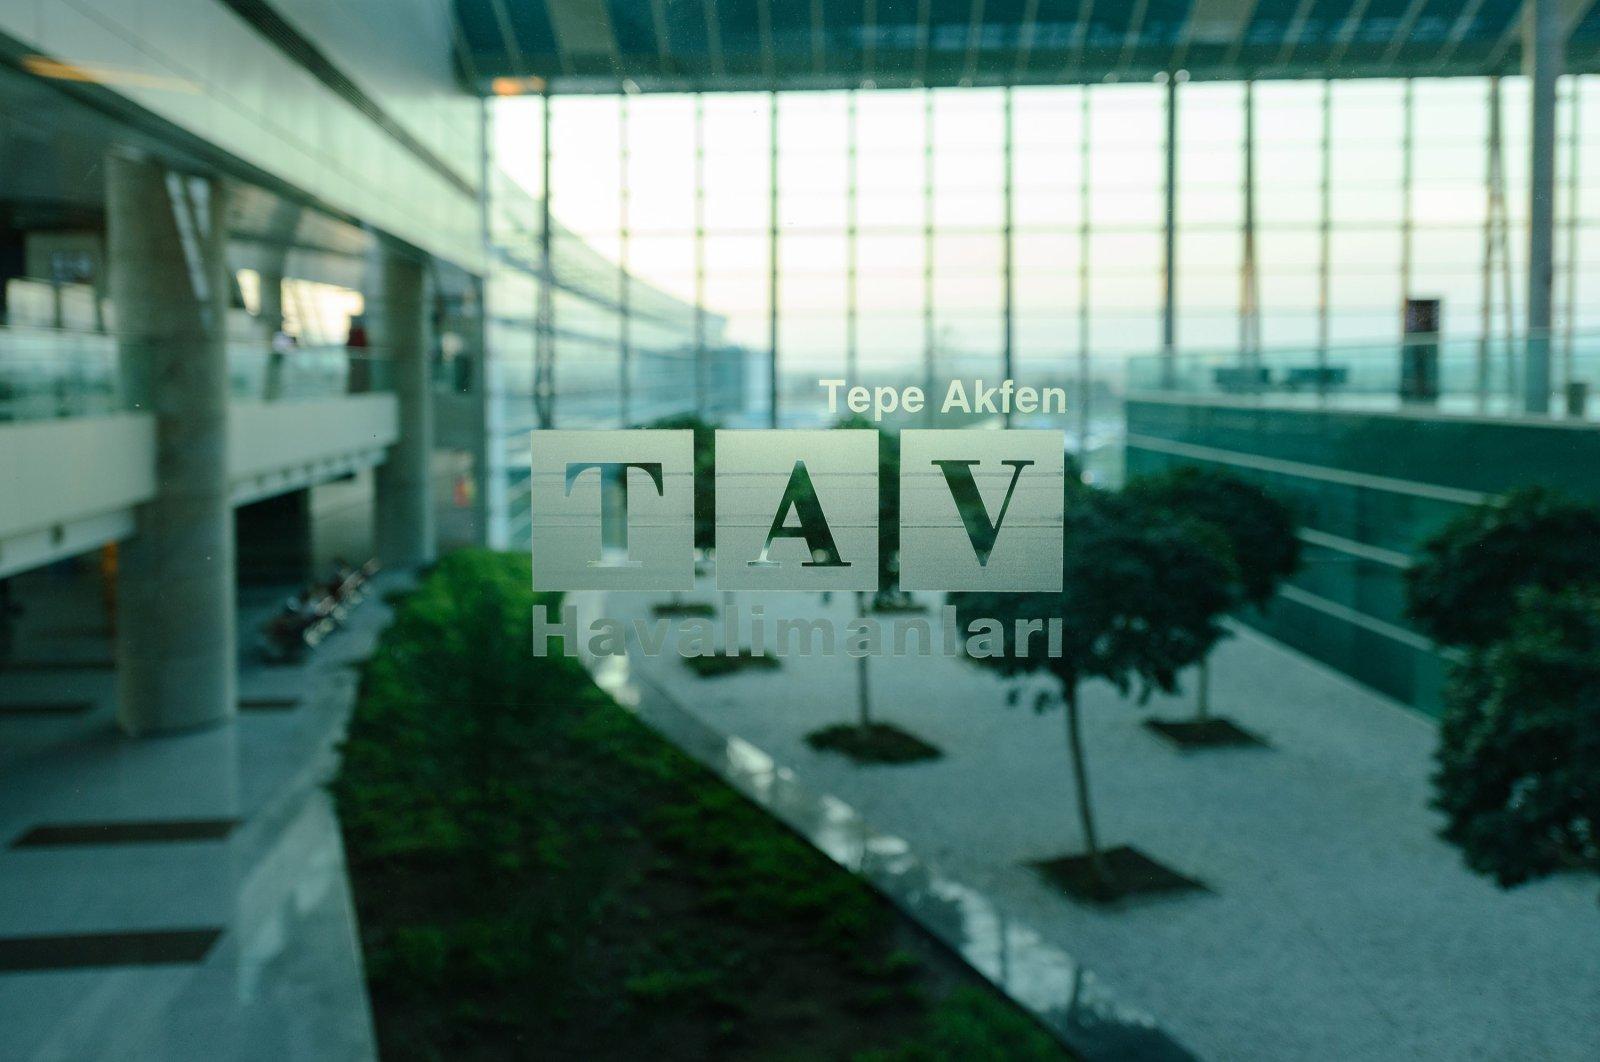 The TAV Airports Holding logo is printed on glass at the Esenboğa International Airport, Ankara, Turkey, Aug. 19, 2017. (Shutterstock Photo)